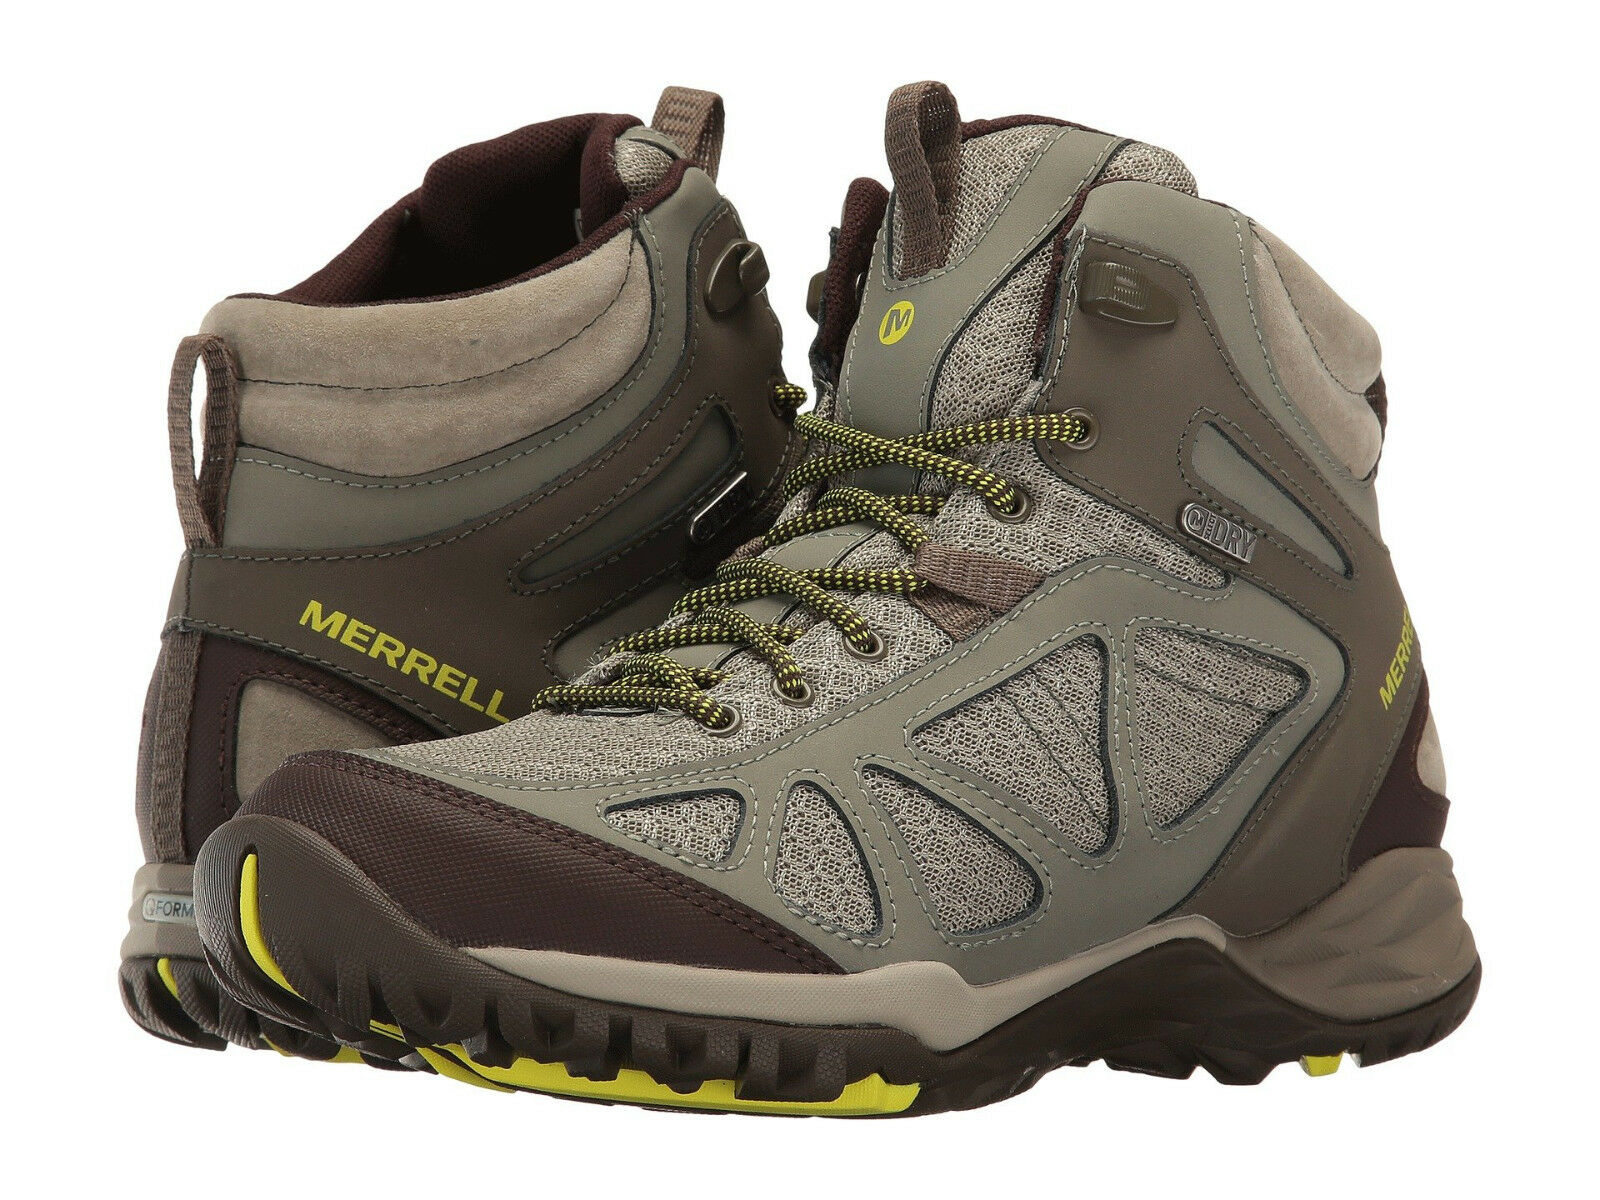 consegna gratuita Merrell donna Siren Sport Q2 Mid Waterproof Ankle Trail Hiking Hiking Hiking Snow stivali  vendita online risparmia il 70%